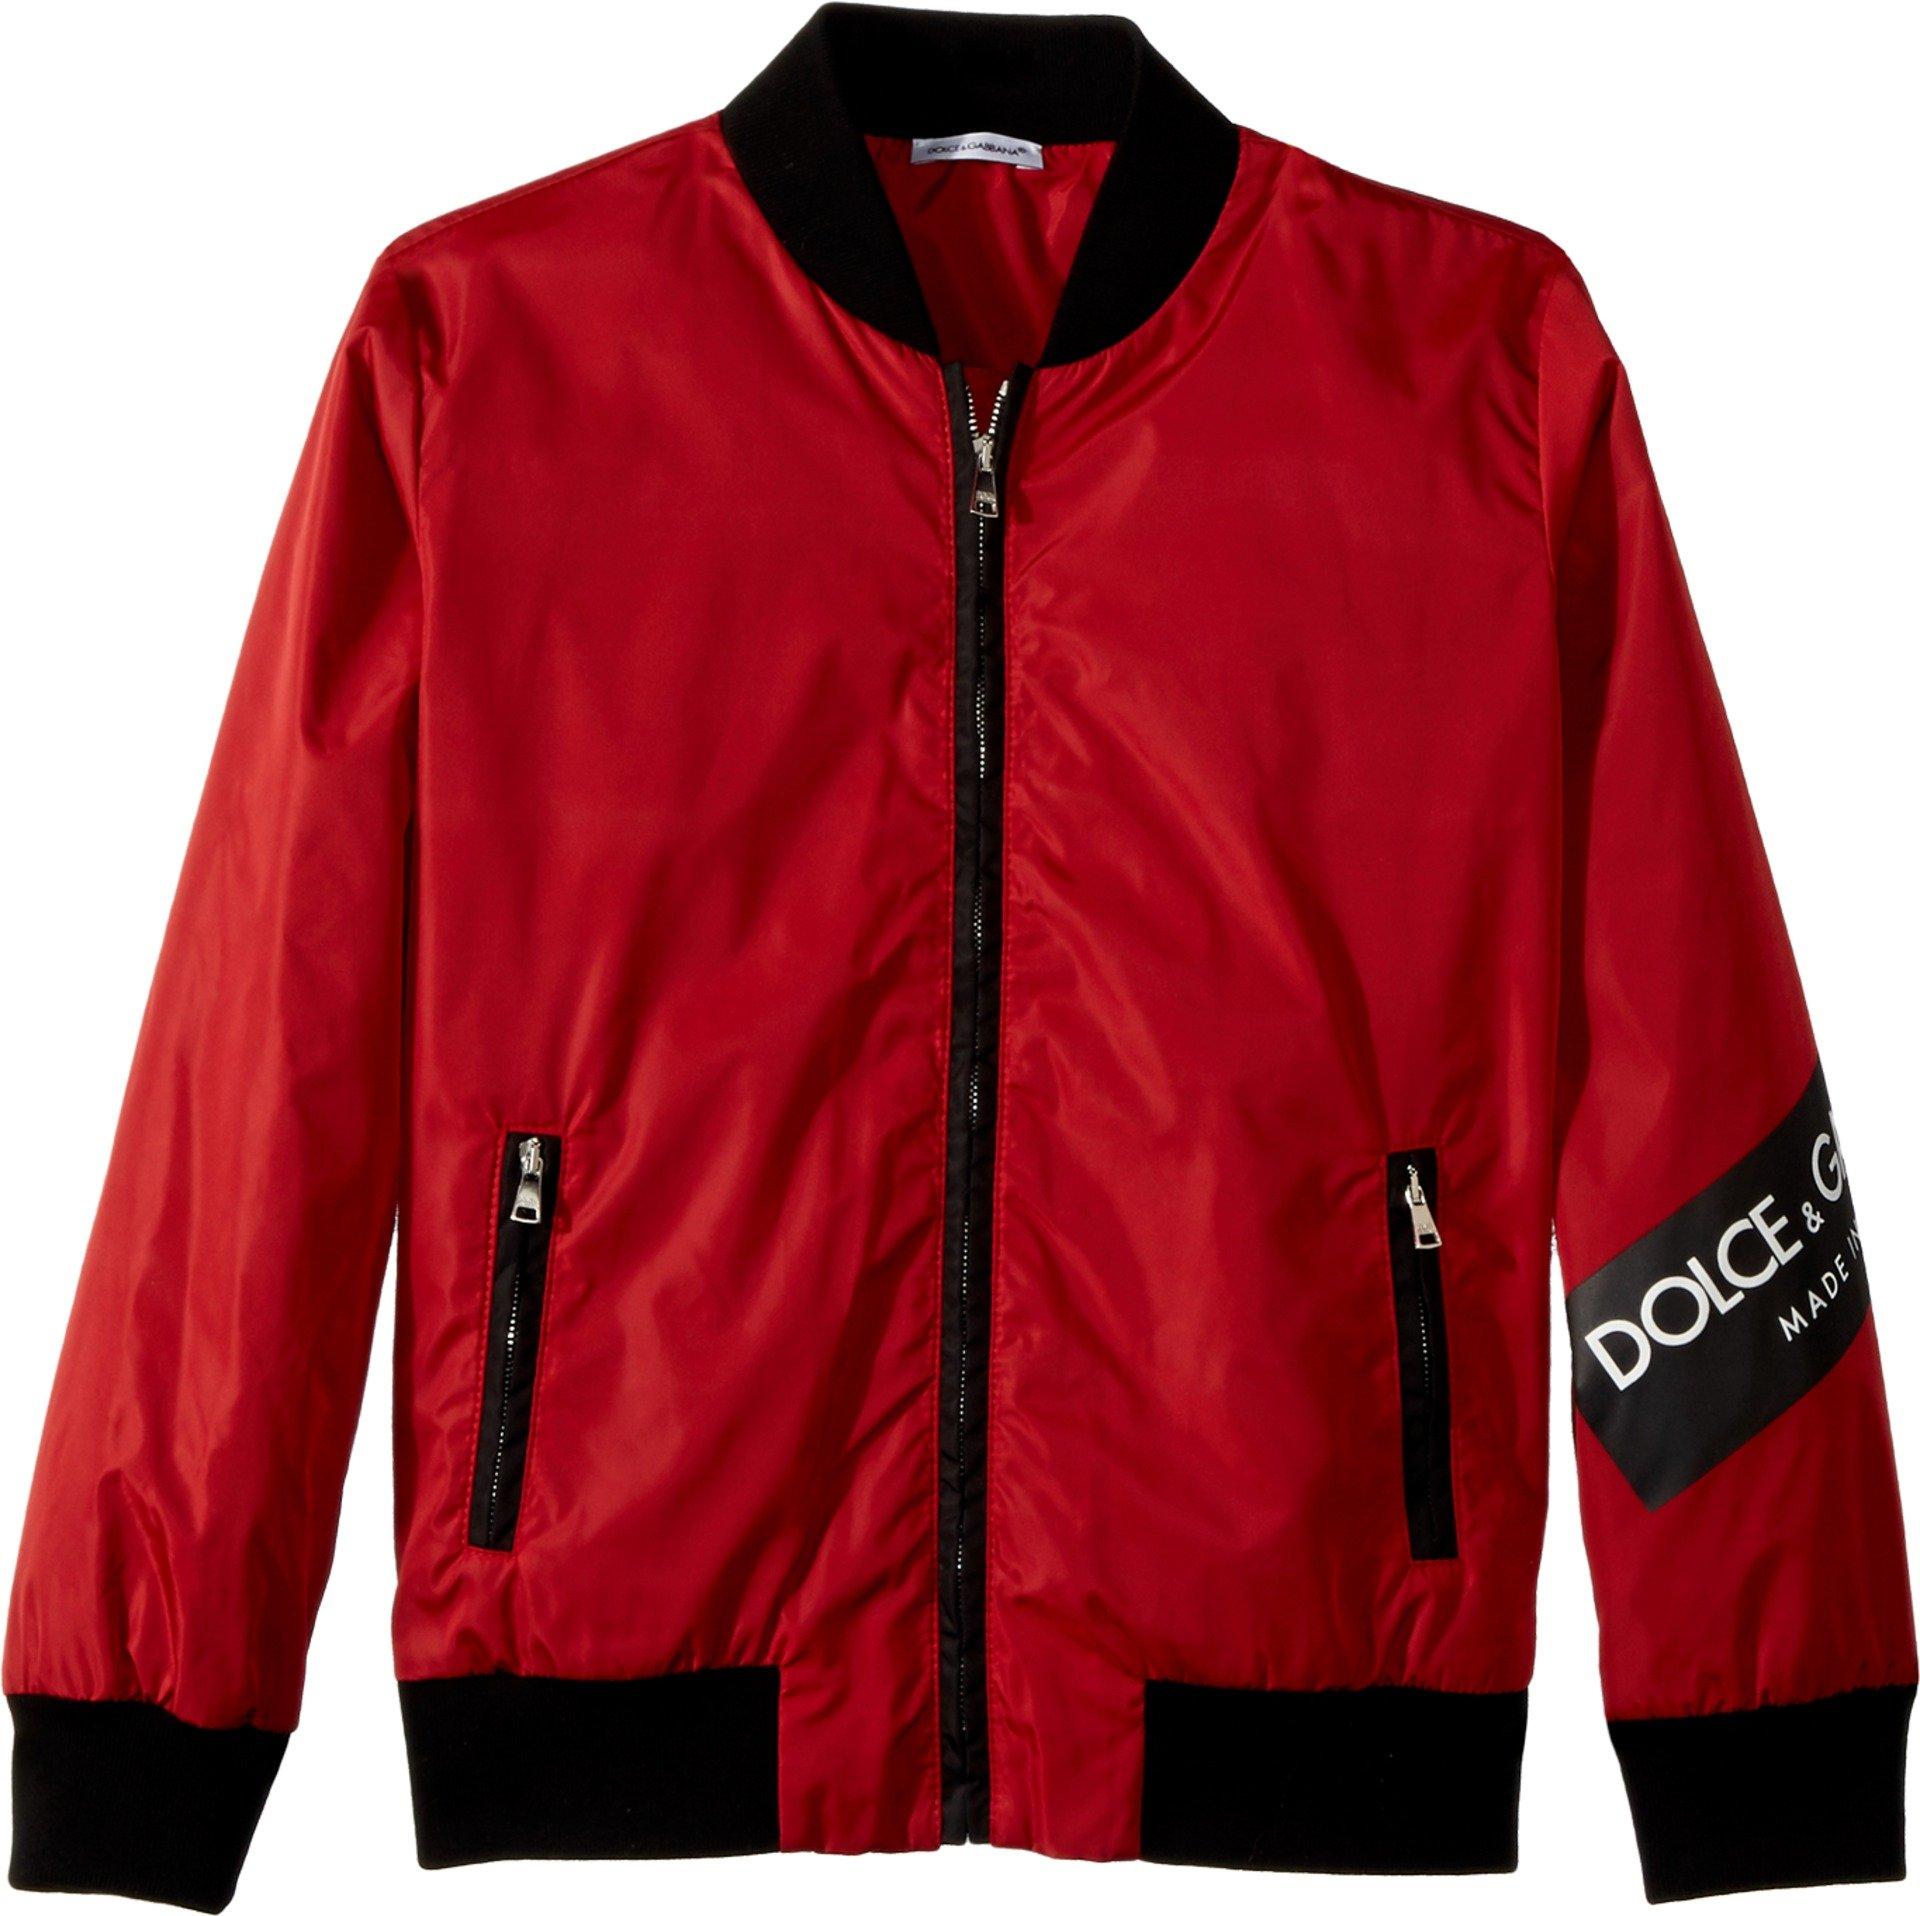 Dolce & Gabbana Kids Boy's Blouson (Big Kids) Bright Red 10